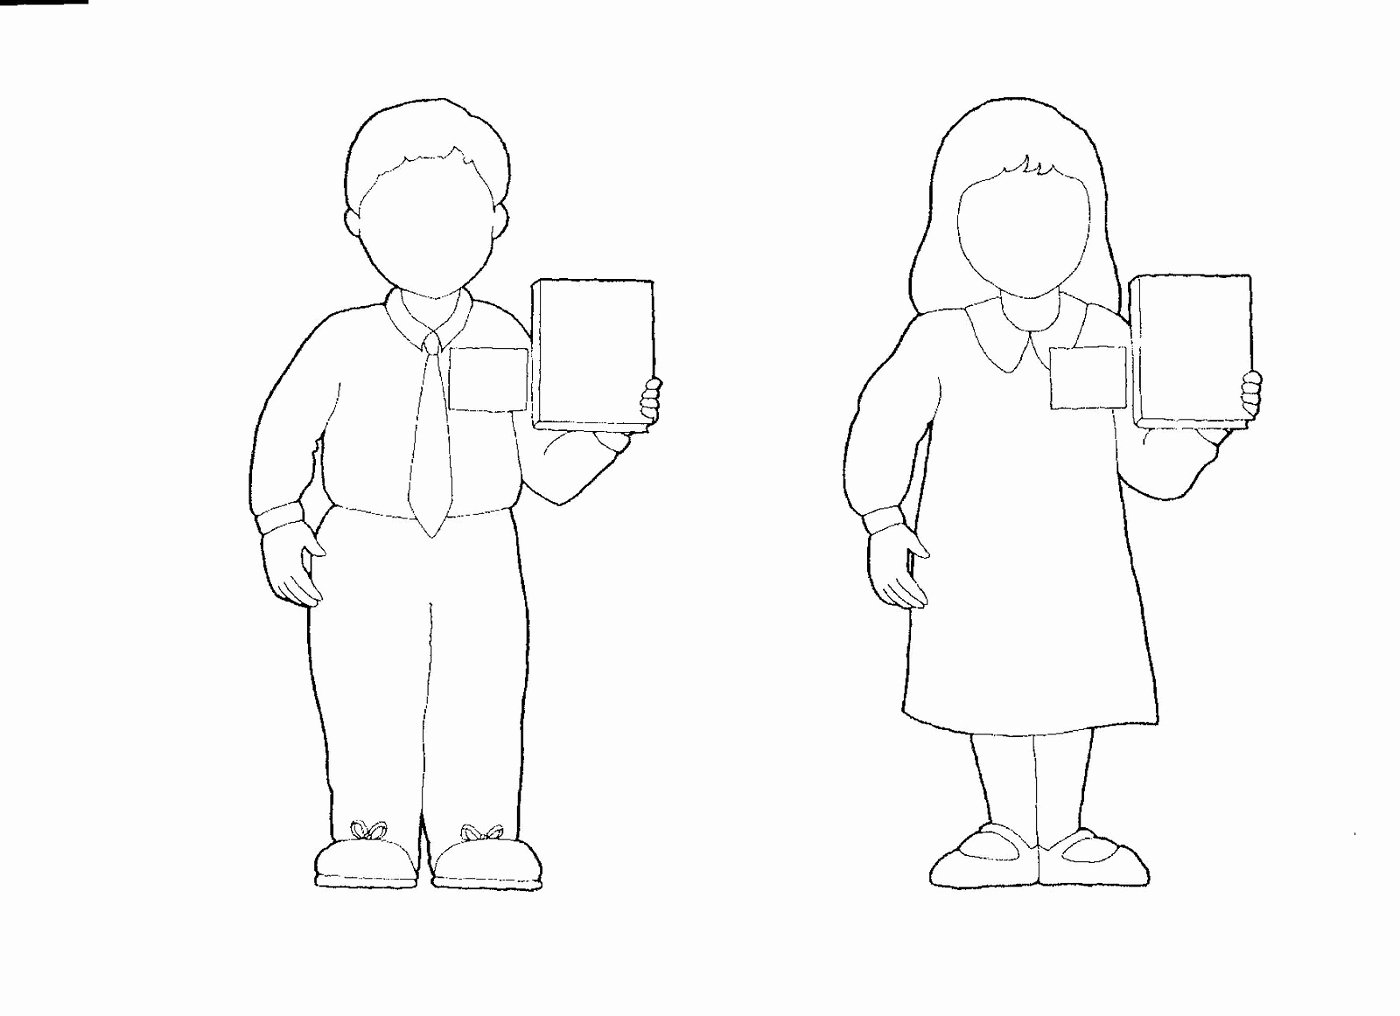 Boy and Girl Template Elegant Boy and Girl Templates Printable